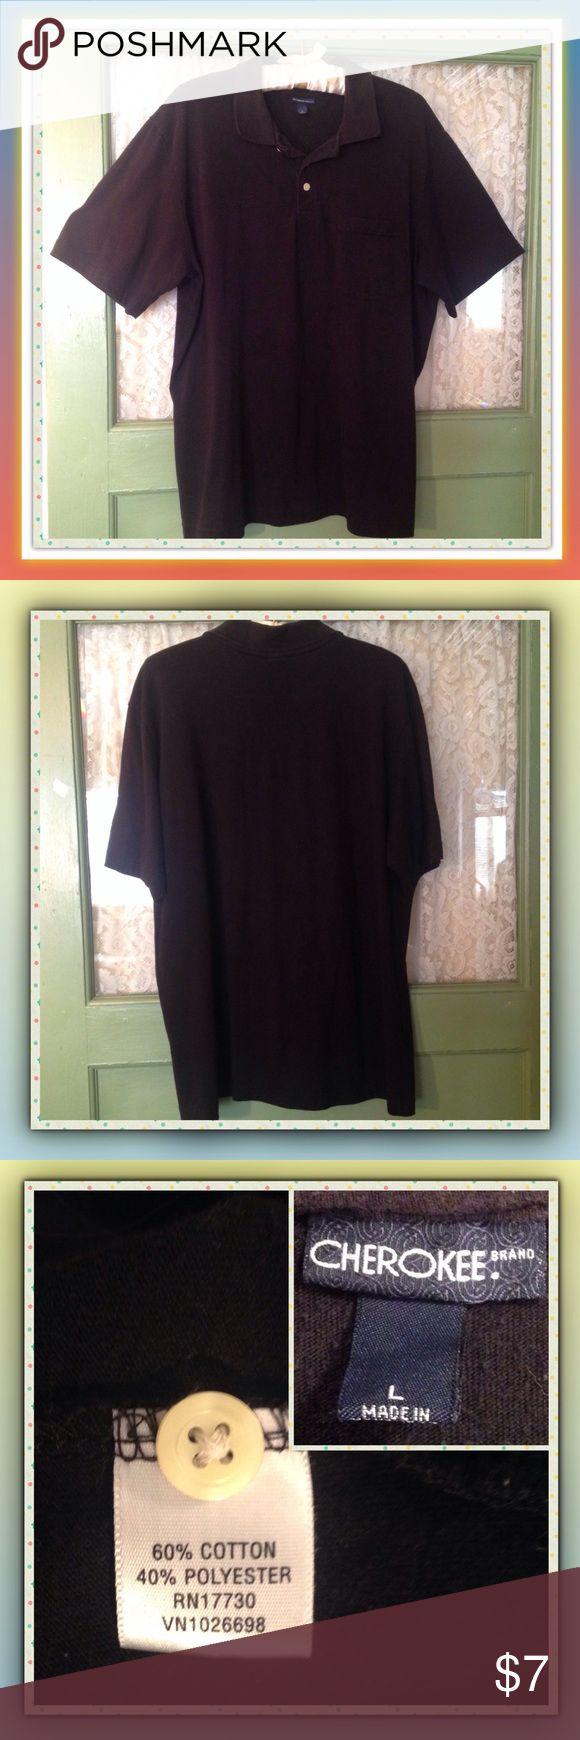 Men' CHEROKEE Brand Black Polo Shirt Black 3-button pullover CHEROKEE Brand Polo shirt. Size L 60% Cotton 40% Polyester Cherokee Shirts Polos